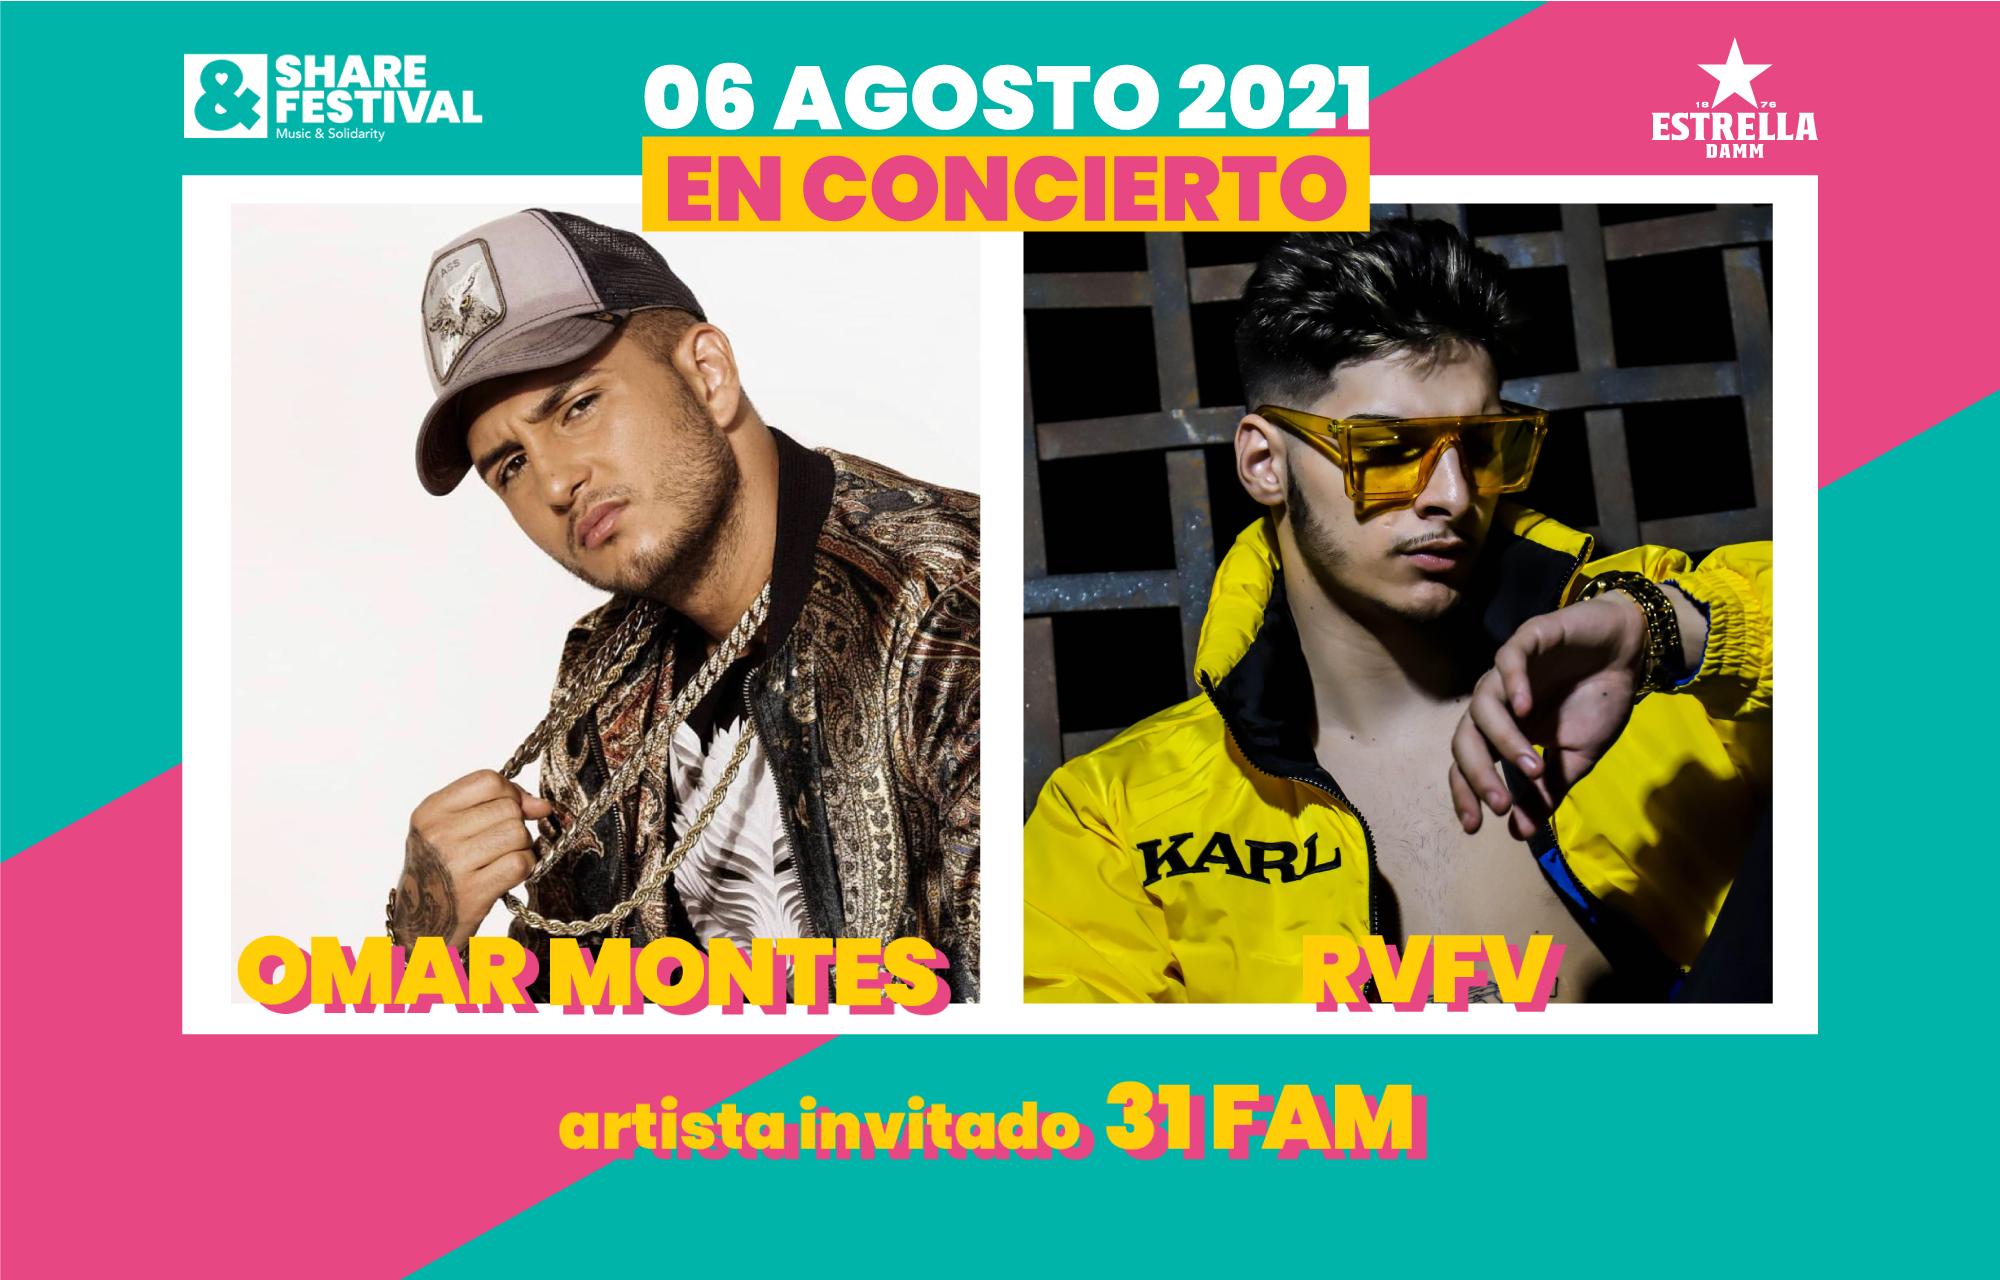 omar montes rvfv 31fam share festival 2021 1620030109416867